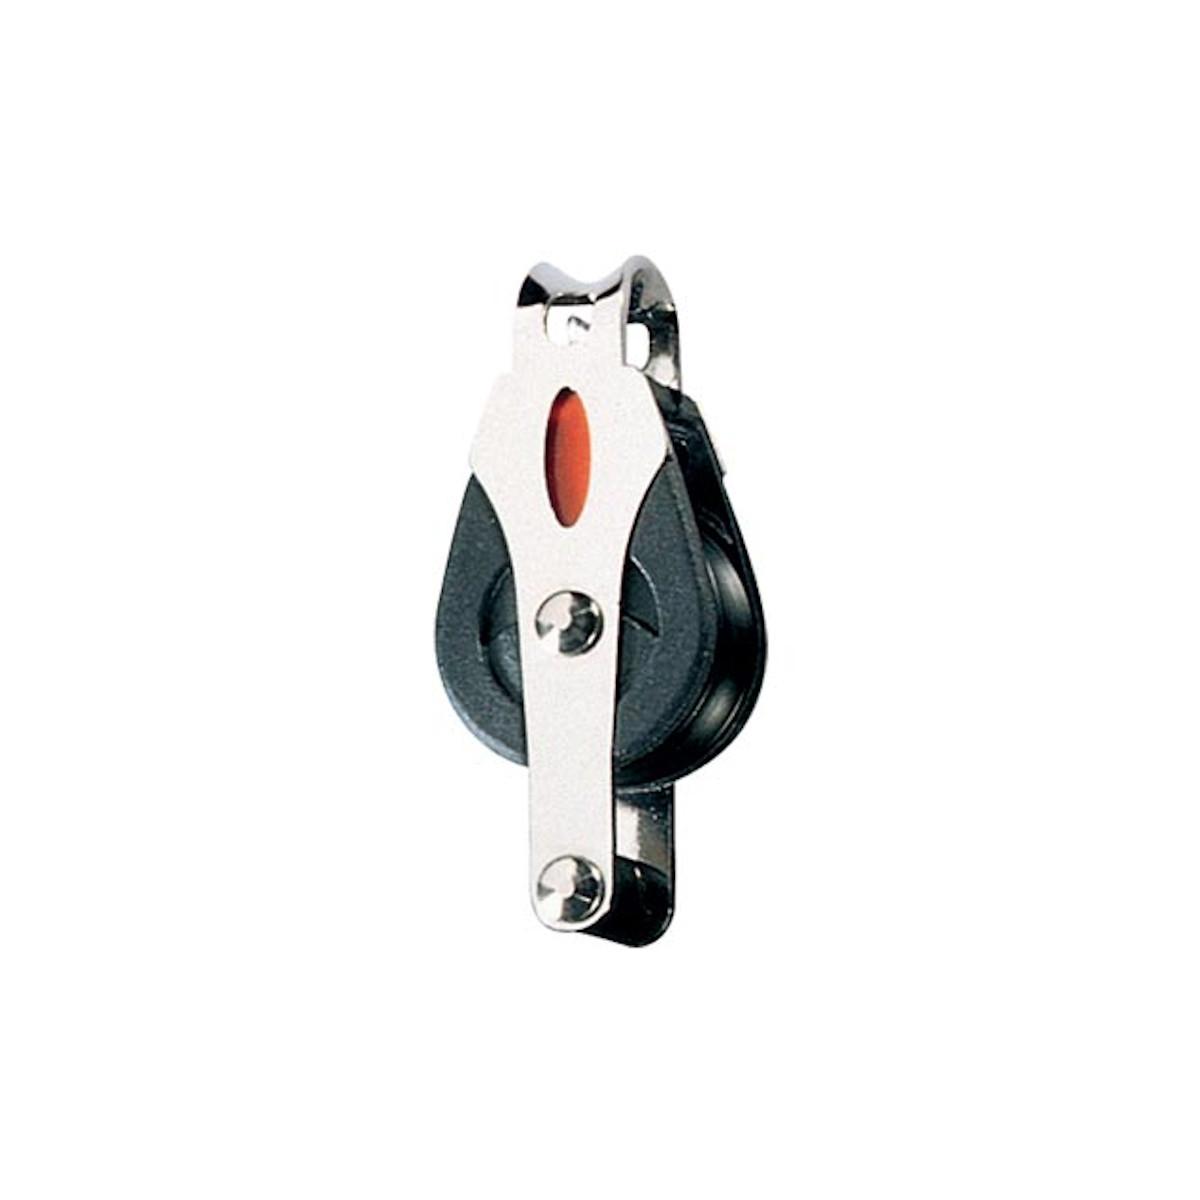 Motón Simple Con Arraigo 20mm Ronstan